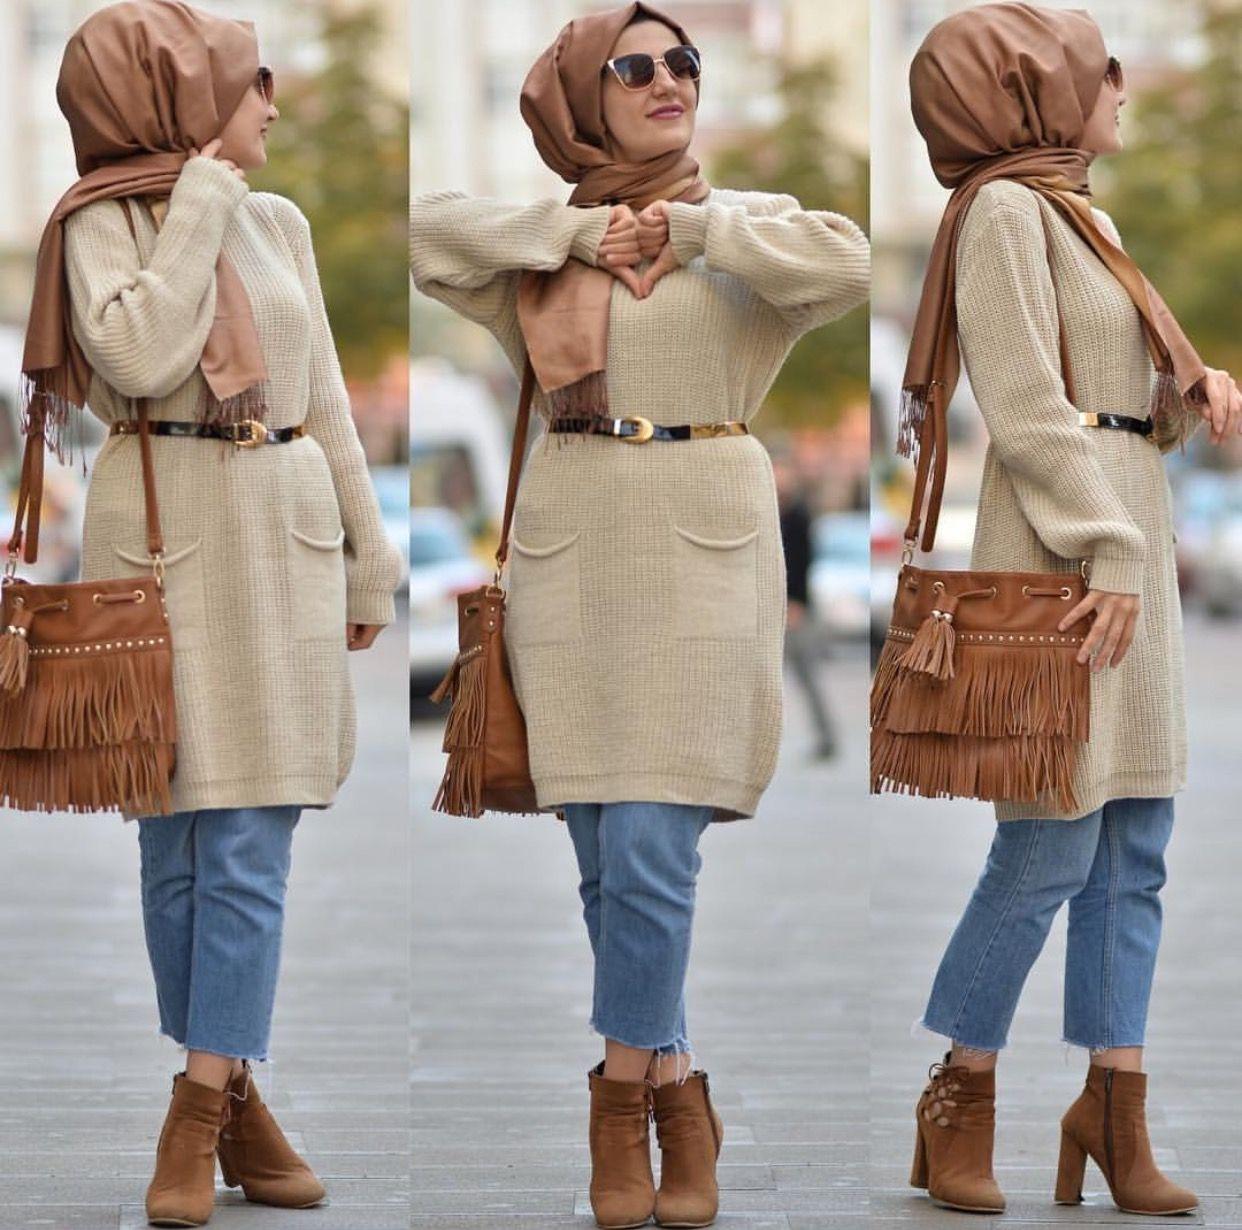 pinterest adarkurdish mode hijab pinterest mode hijab styles de hijab et v tements. Black Bedroom Furniture Sets. Home Design Ideas